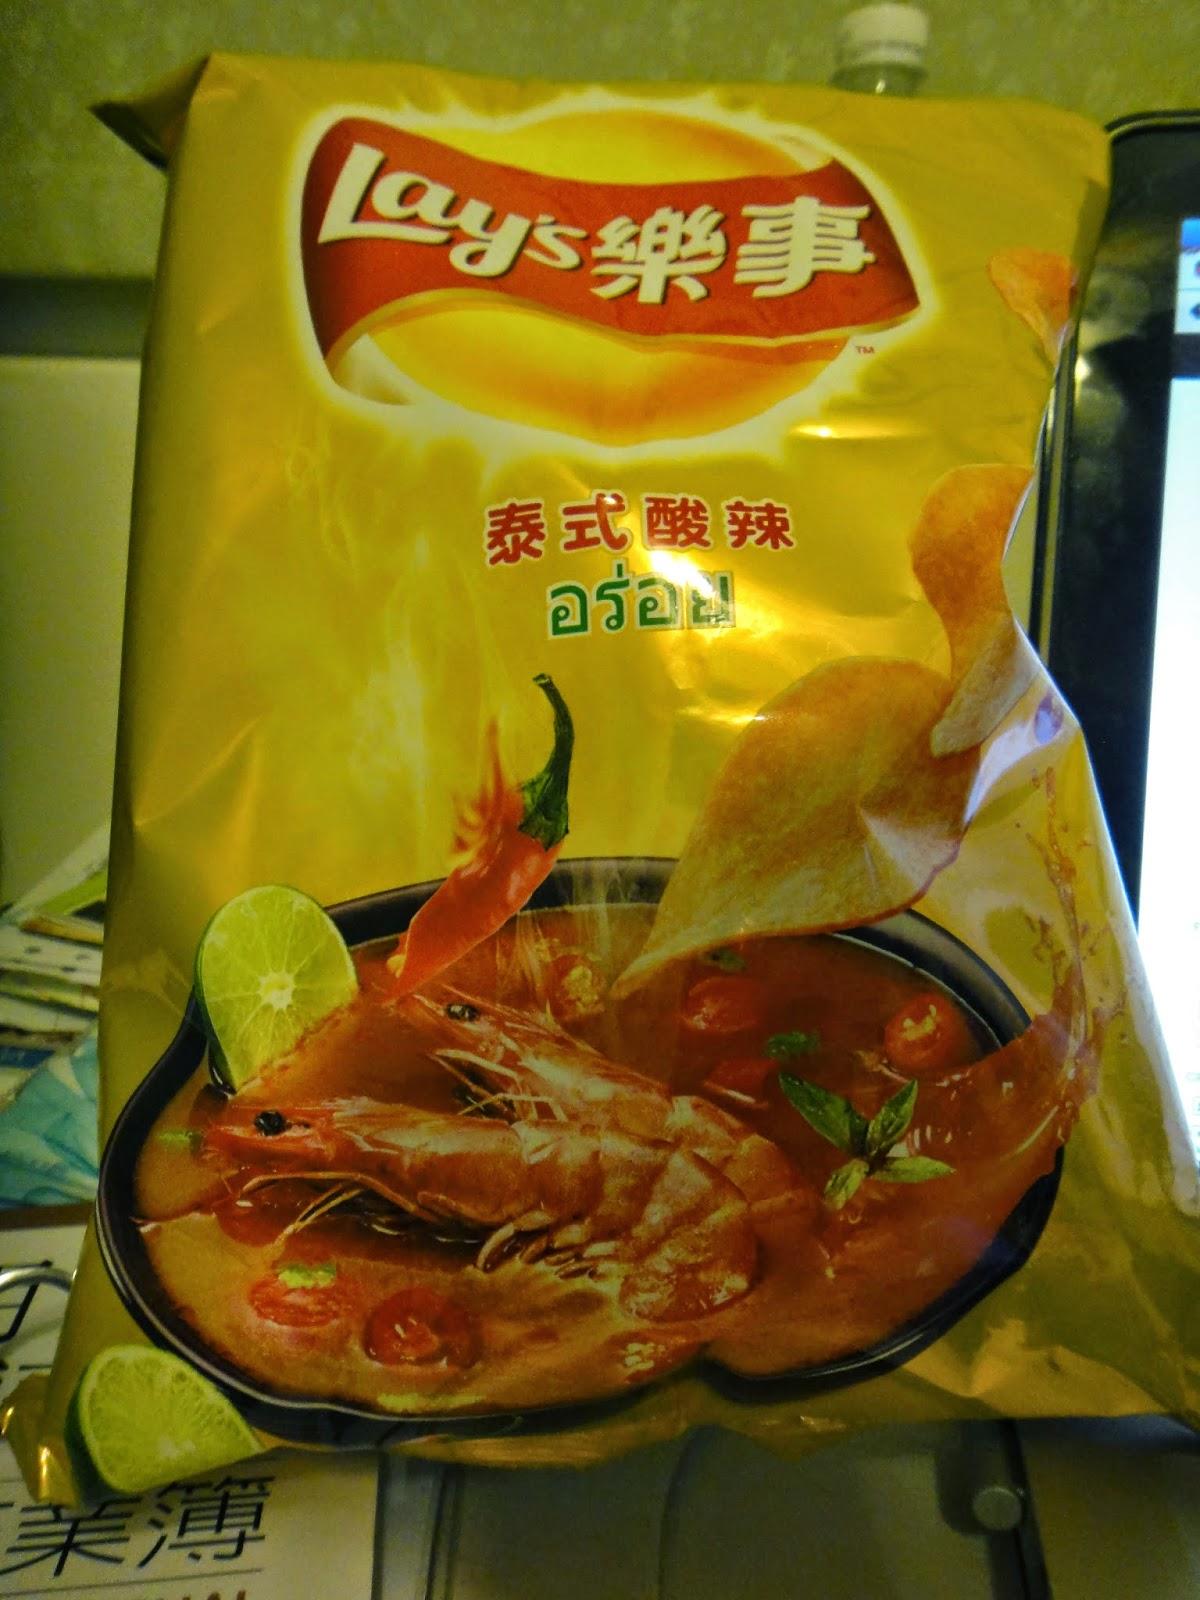 Tom Yum Lays Potato Chips Taiwan 7-11